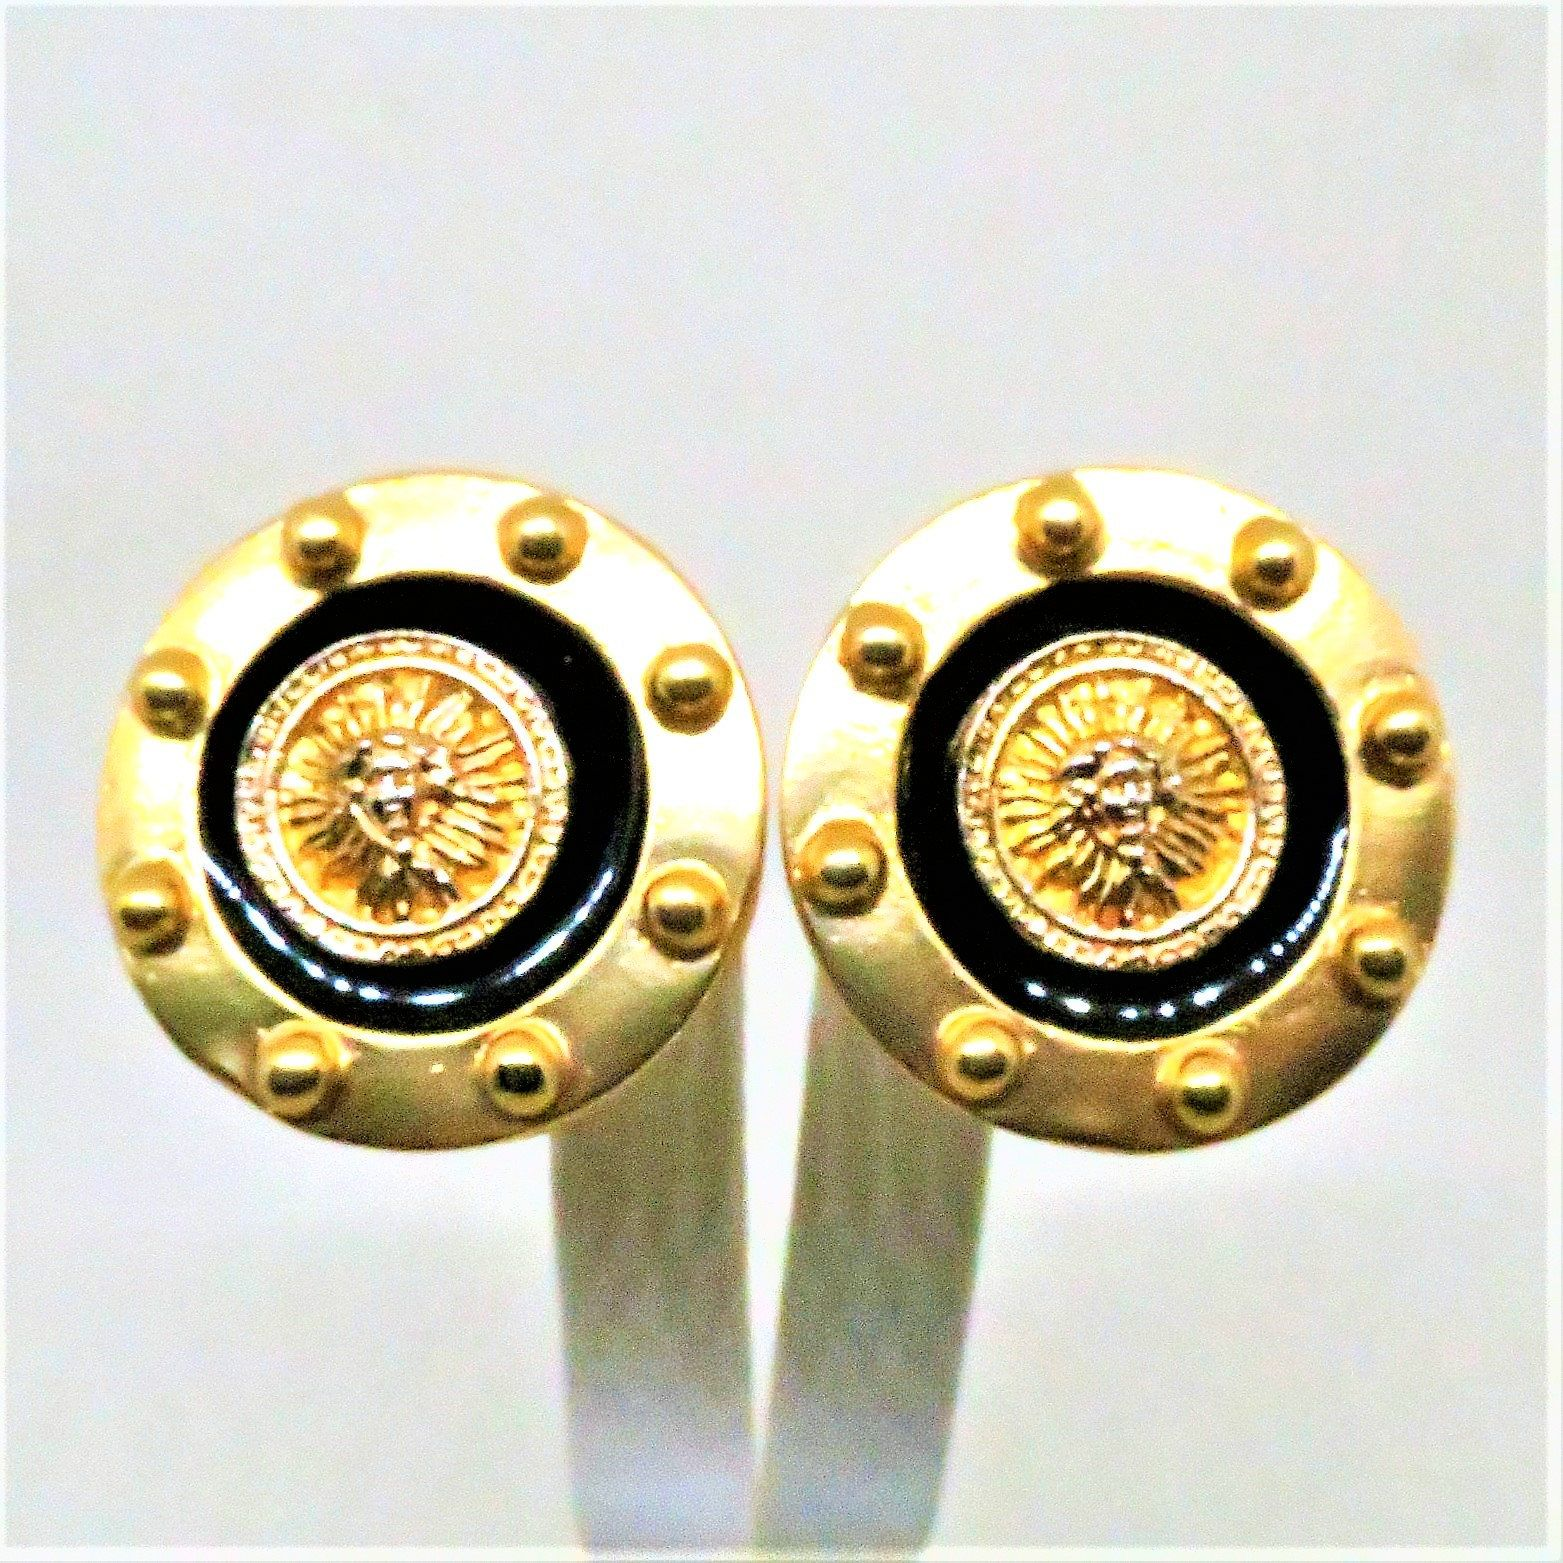 a92b0016e0973 Shield Earrings - Vintage, Gold Tone, Studded, Black Enamel, Clip on ...